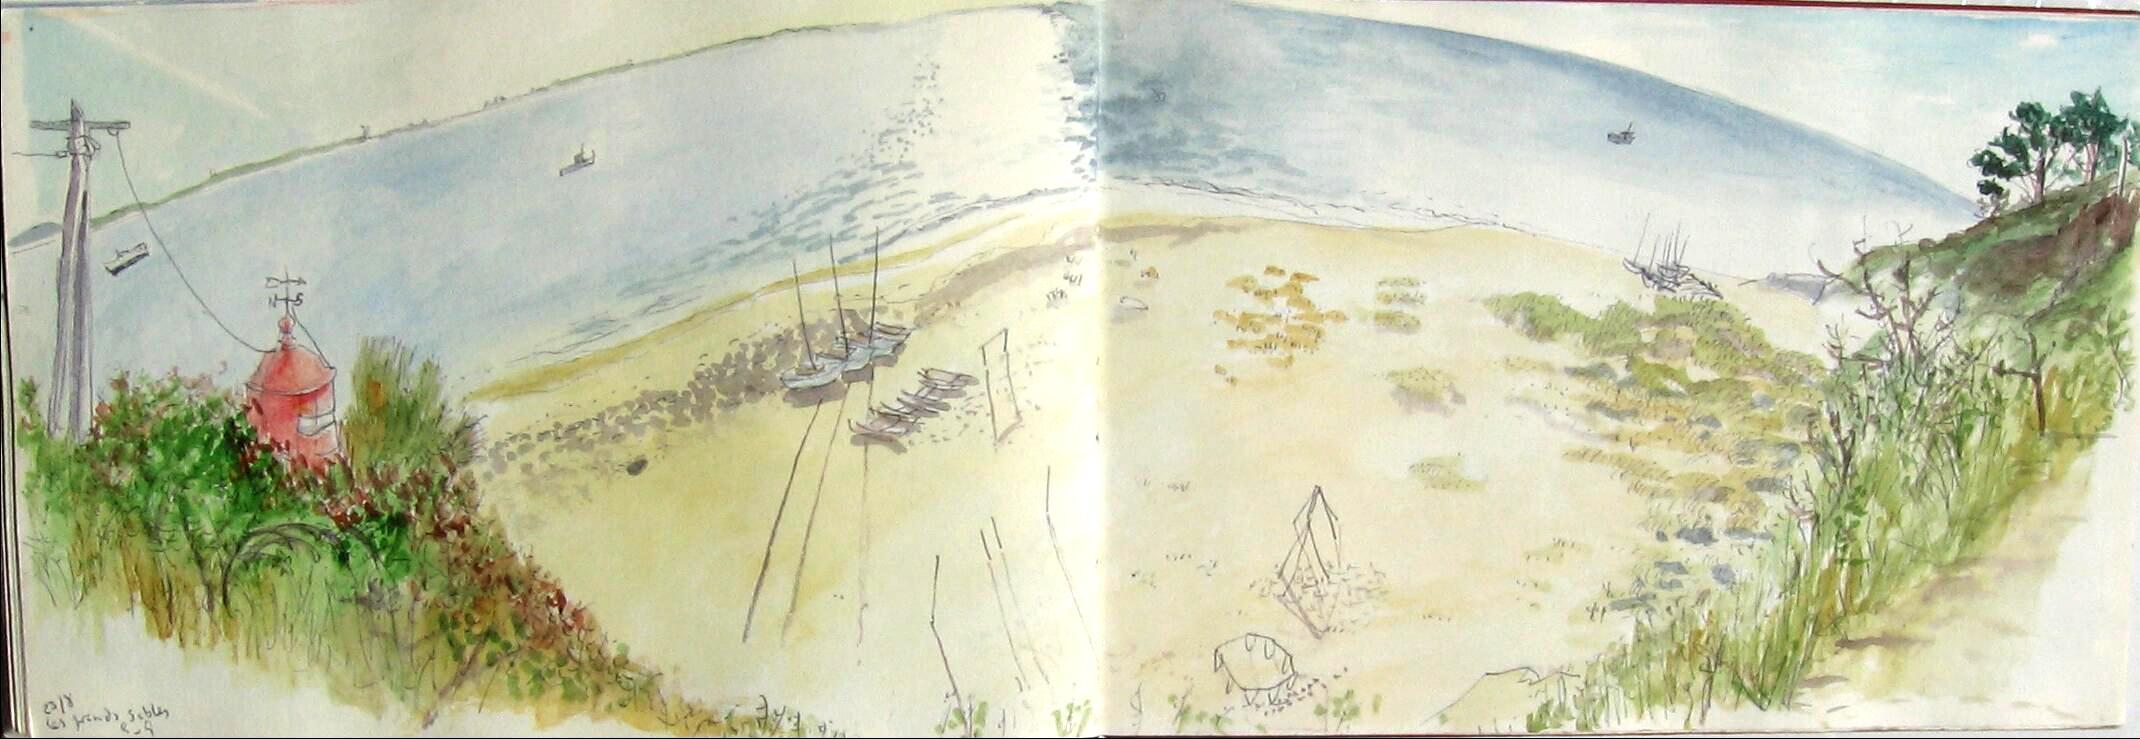 Grnads sables 3